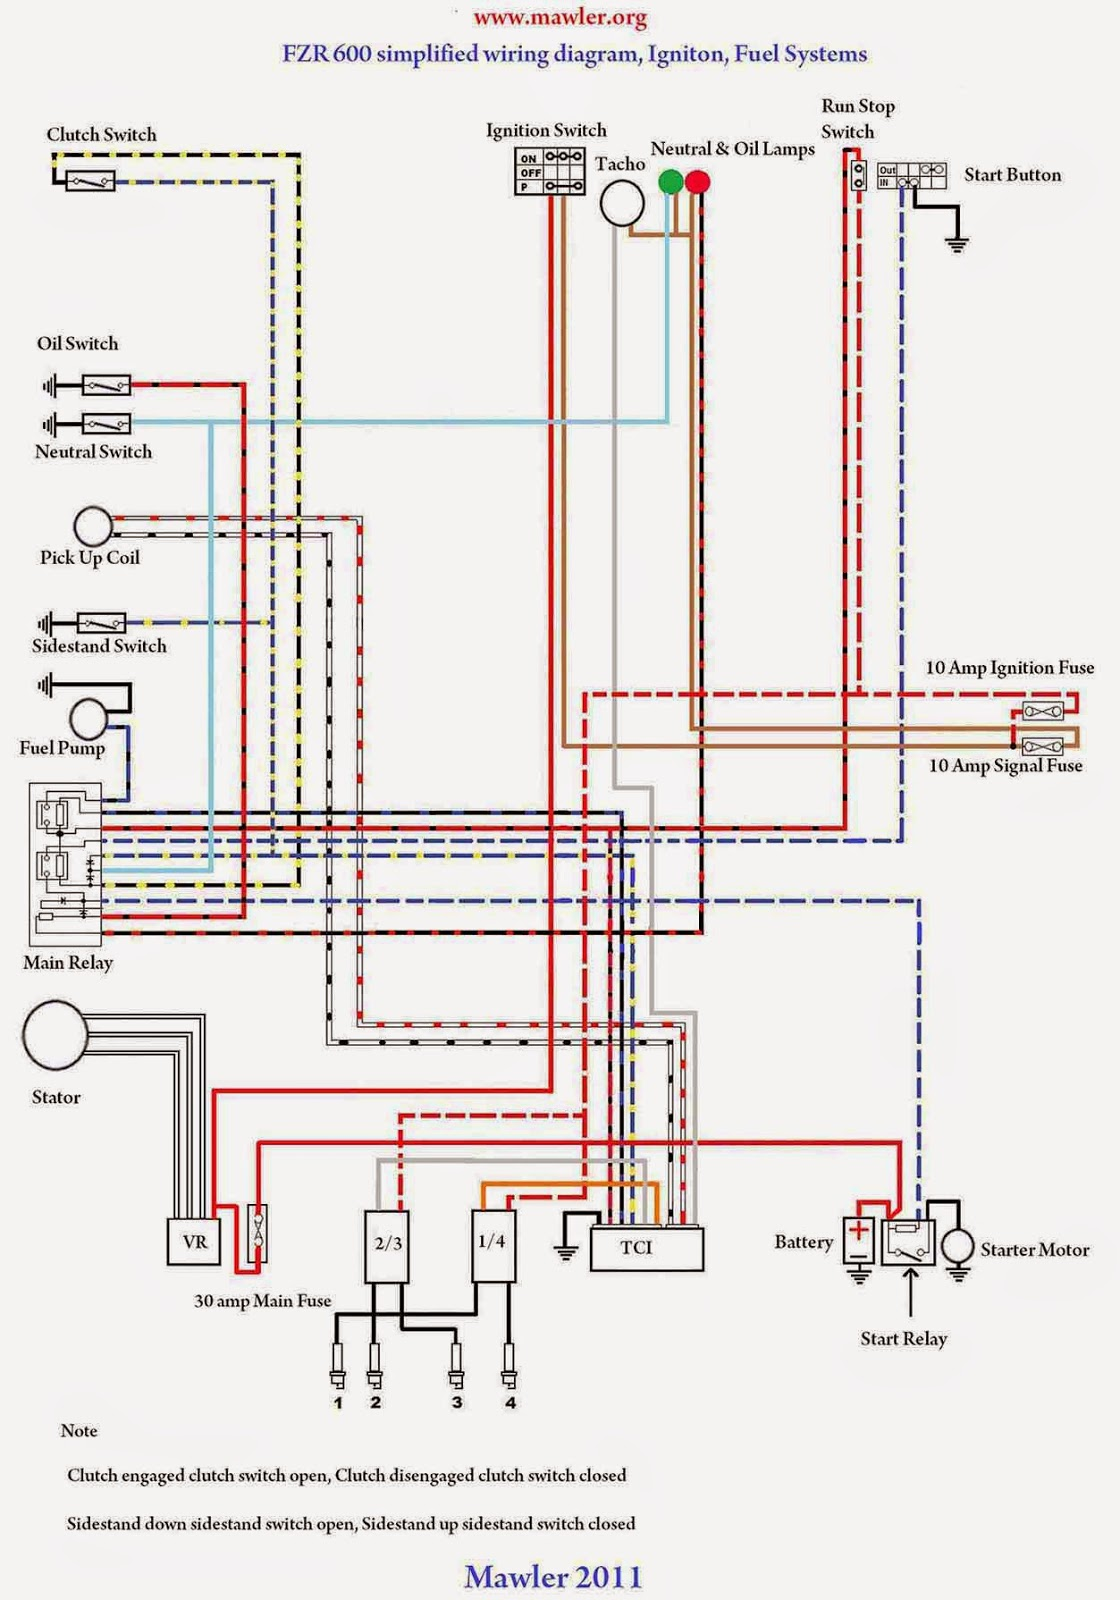 hight resolution of  yamaha fzr600 wiring diagram images of furthermore yamaha 600 wiring sc fzr600 wiring diagram at cita